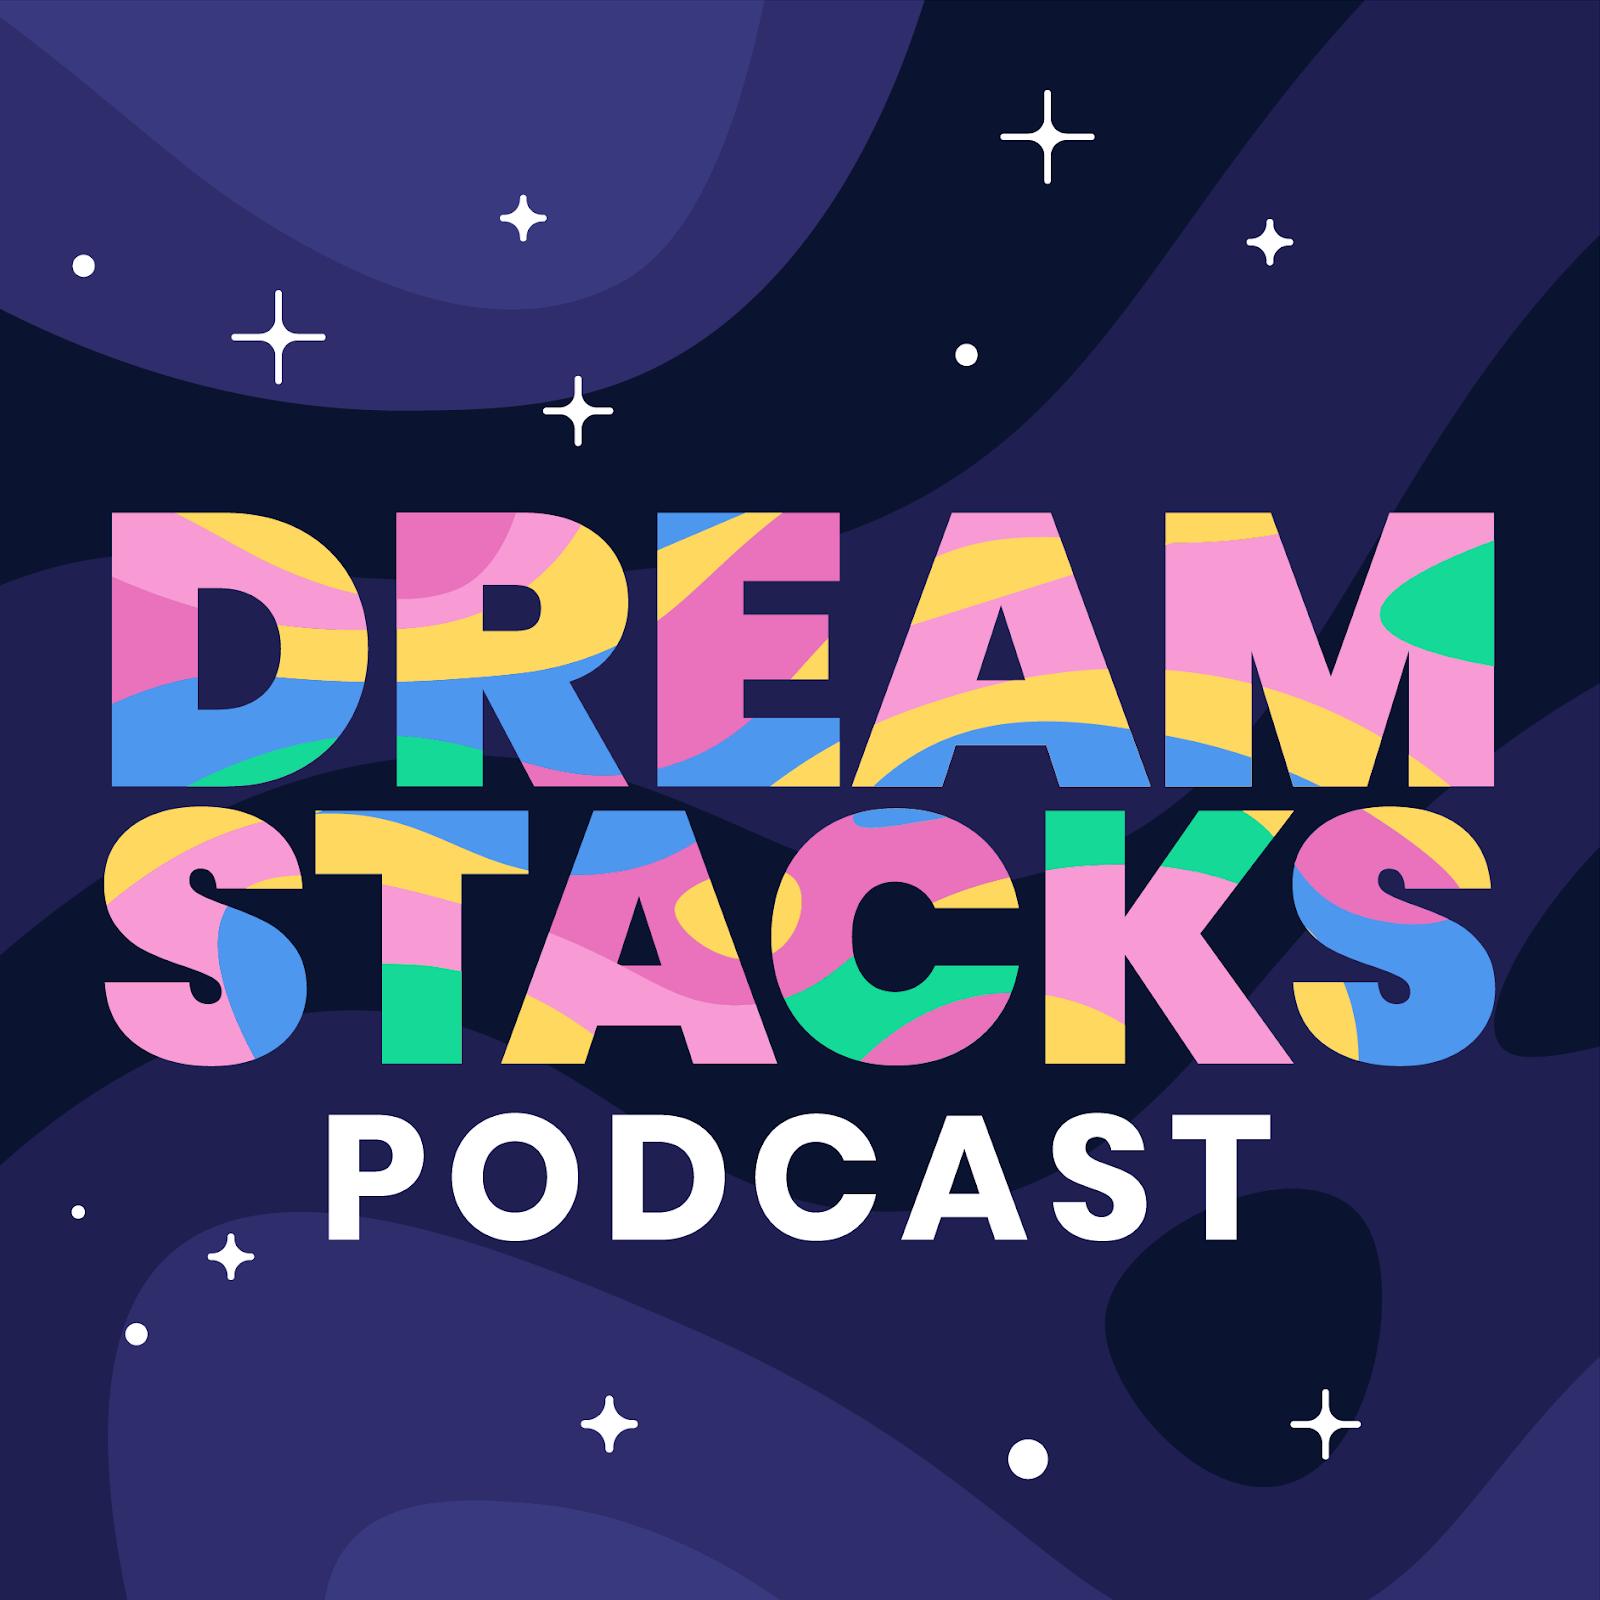 Dreamstacks podcast image